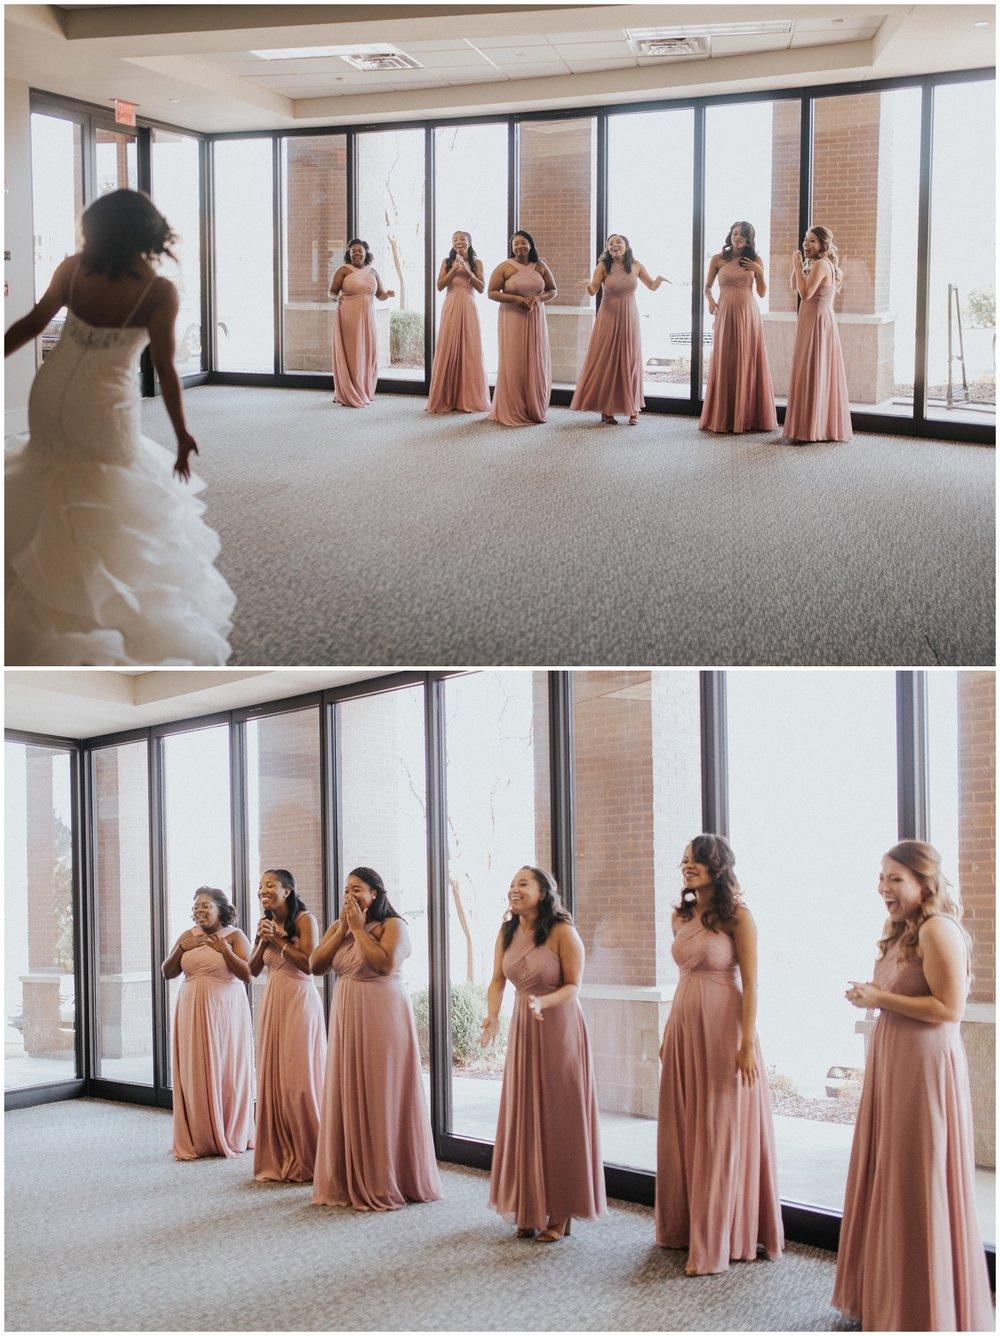 shipley_memphis_wedding_photographer_27.jpg